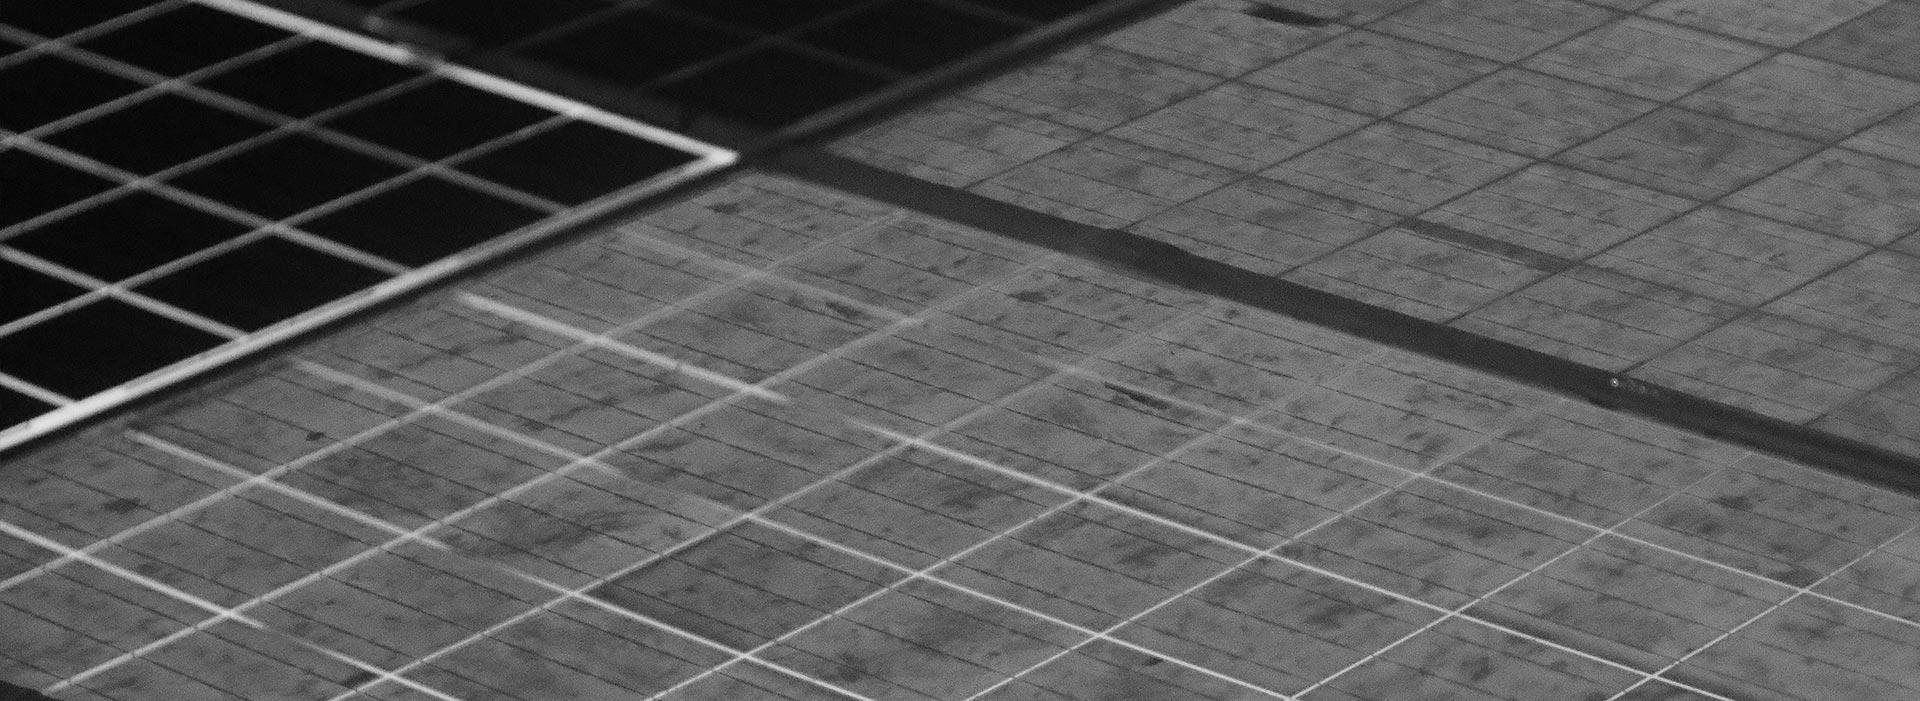 microcracks - elettroluminescenza EL outdoor - moduli fotovoltaici